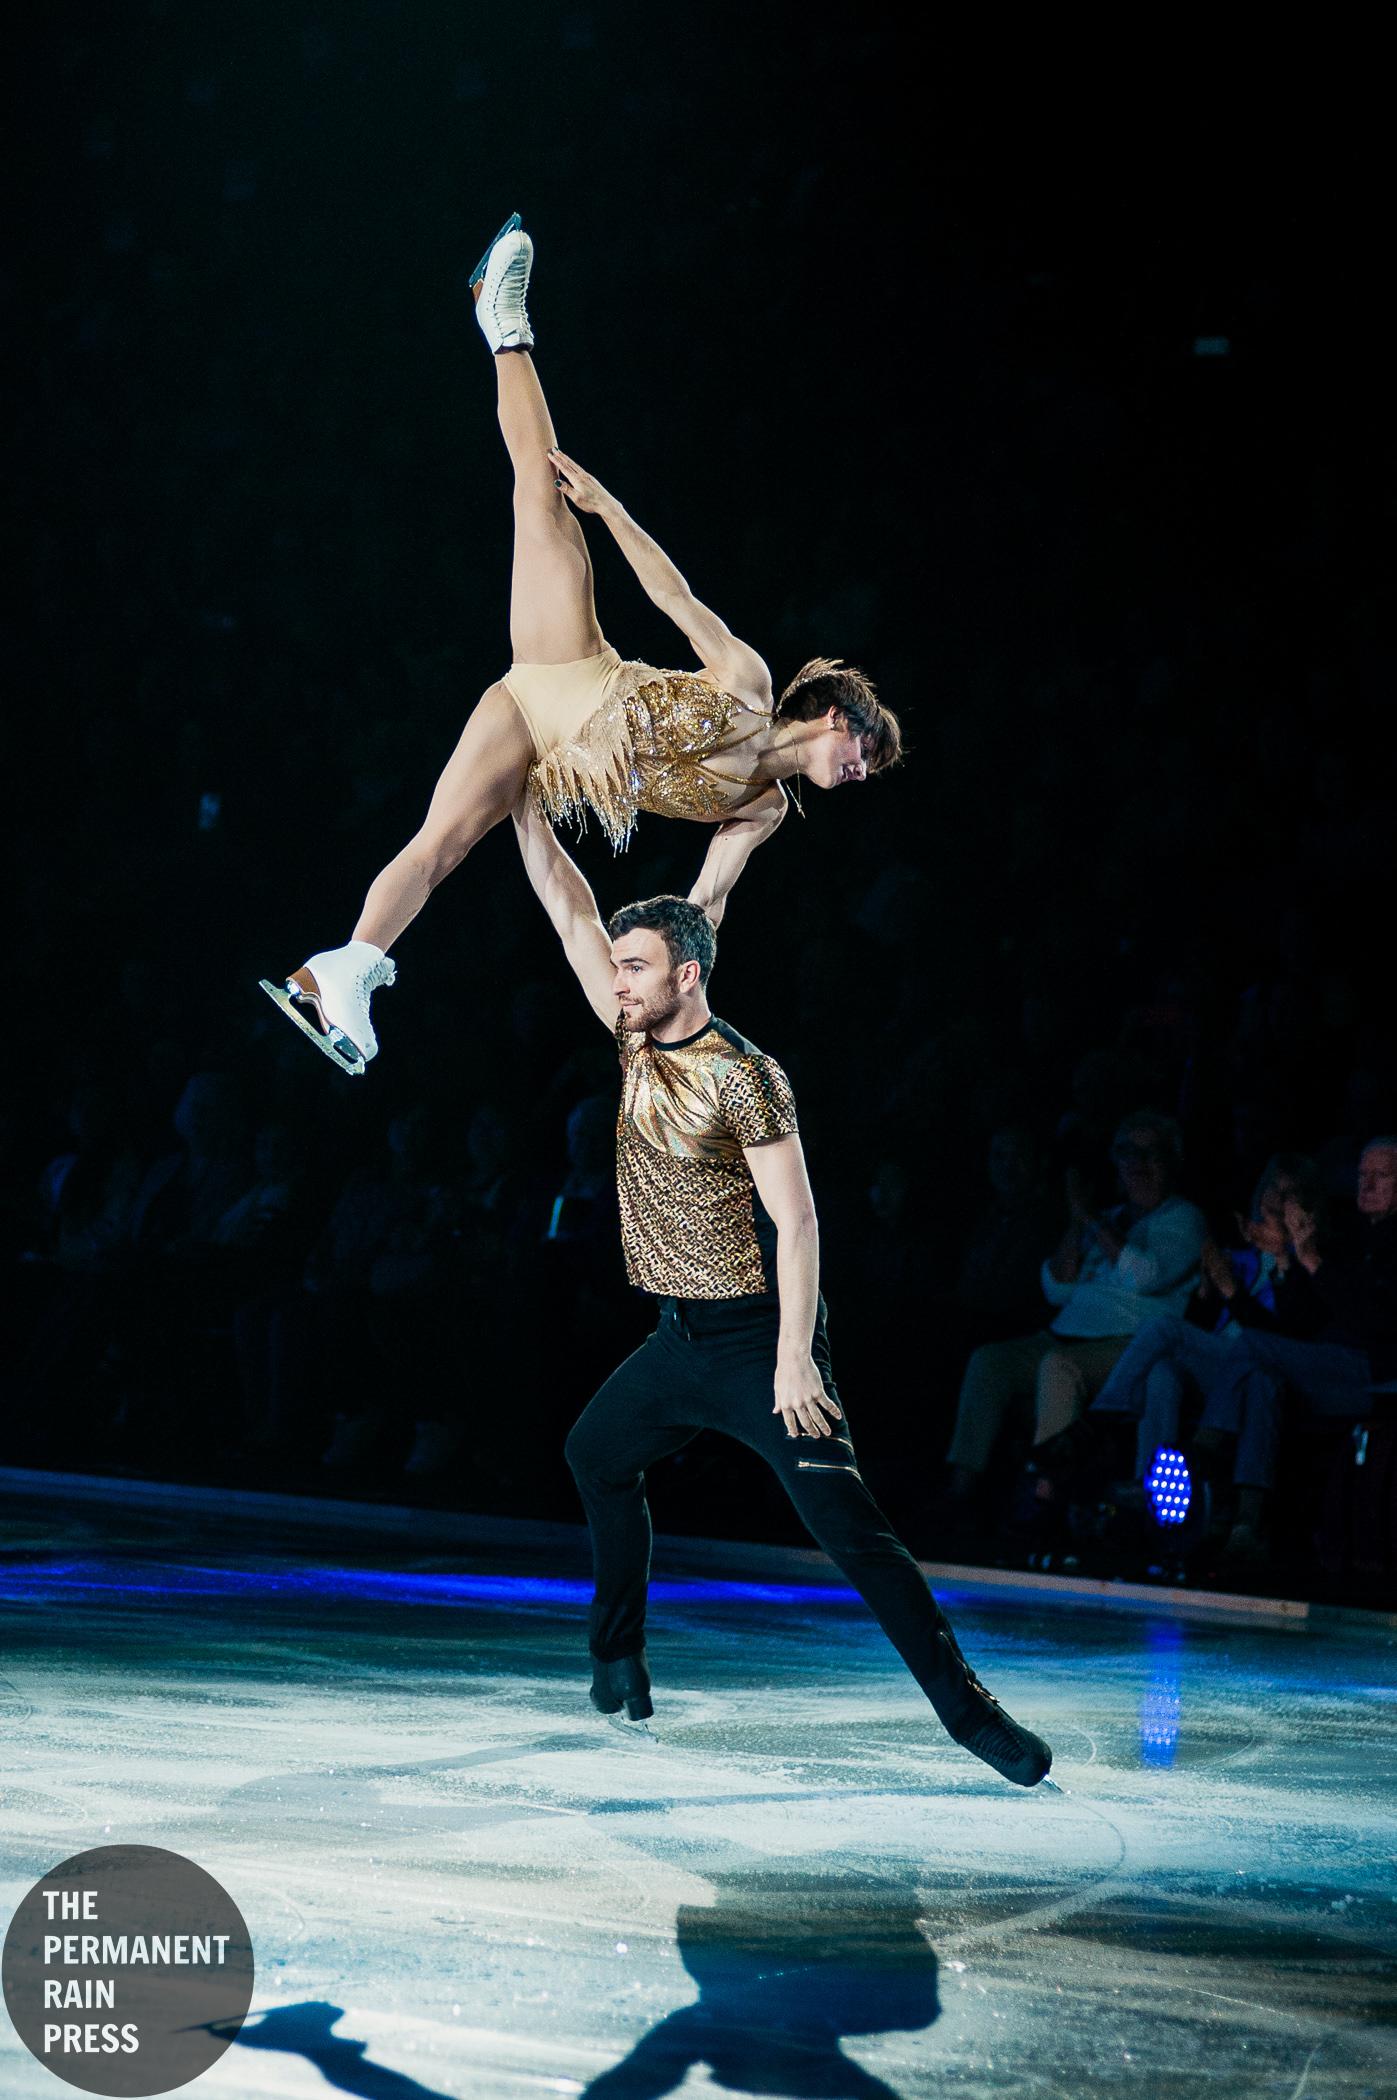 Stars_On_Ice-Rogers-Arena_Timothy_Nguyen-15.jpg